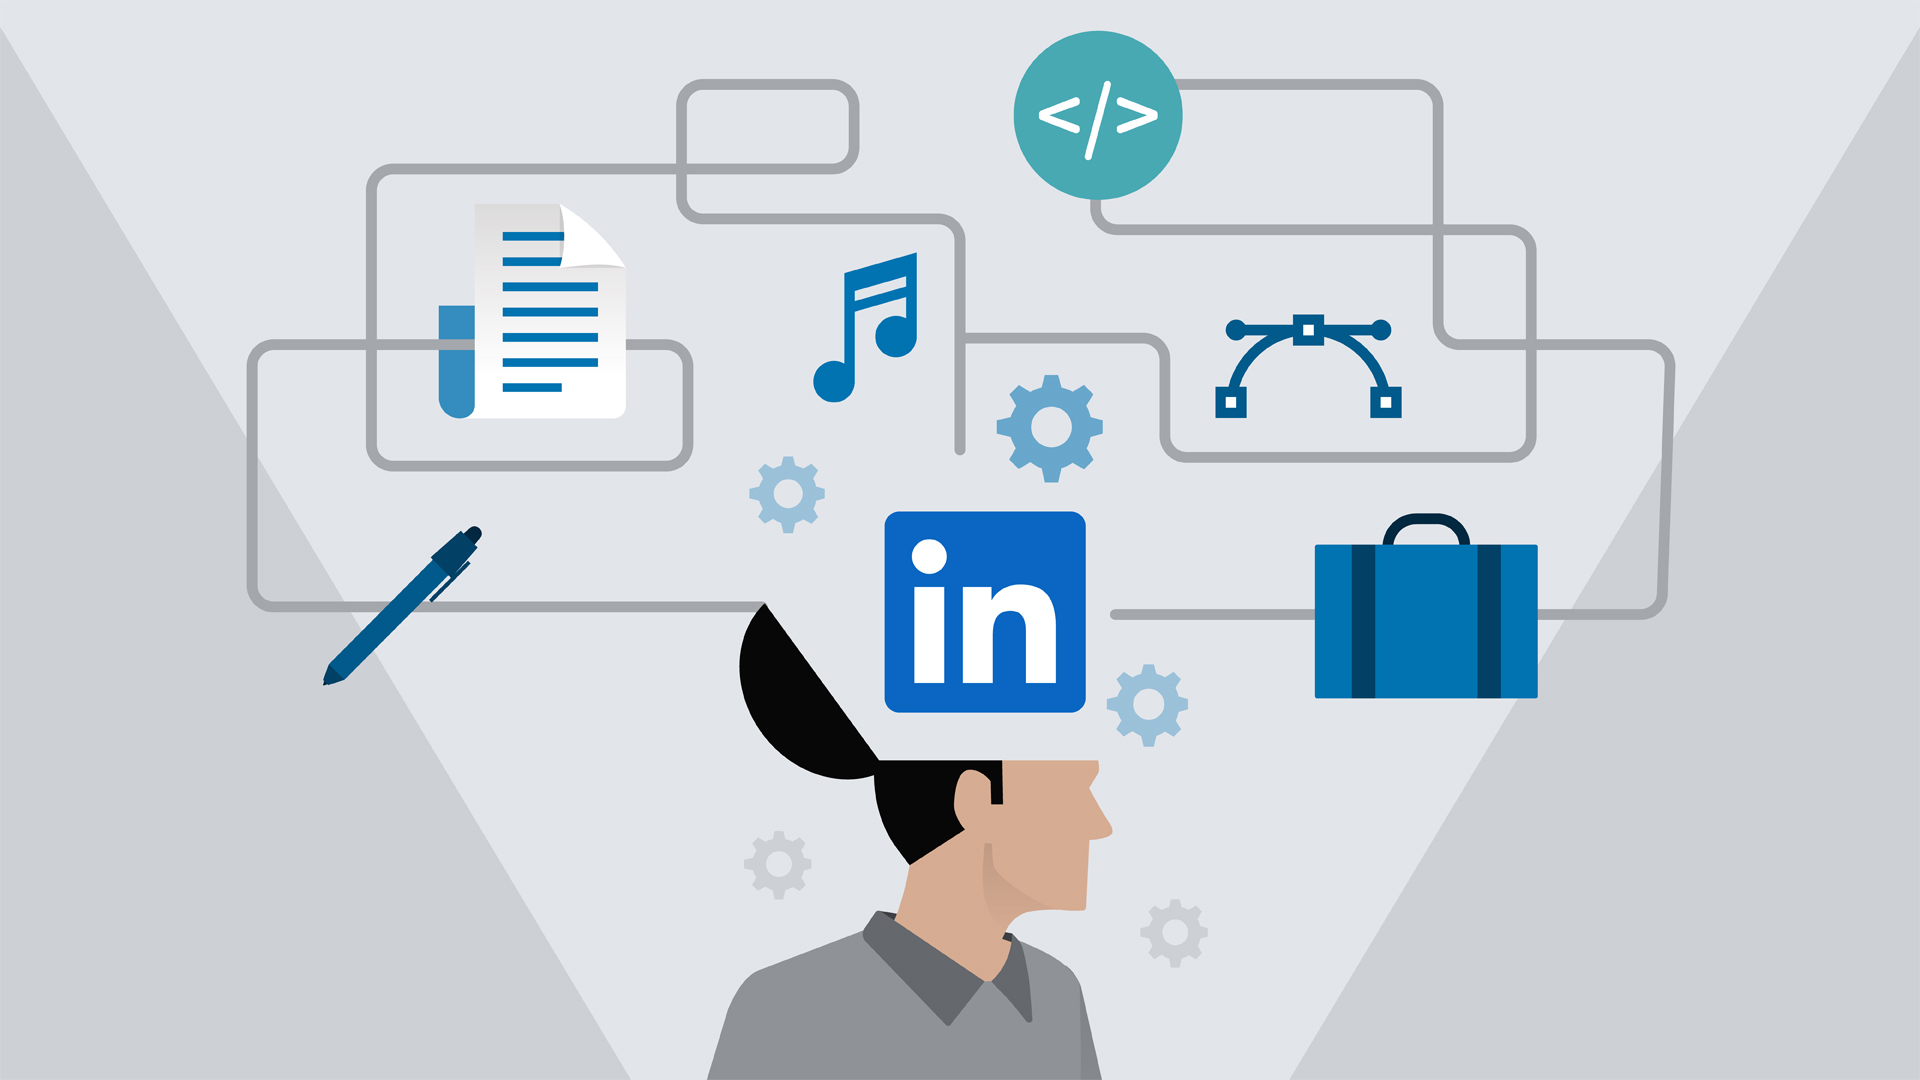 Identify and add skills   Gaining Skills with LinkedIn Learning